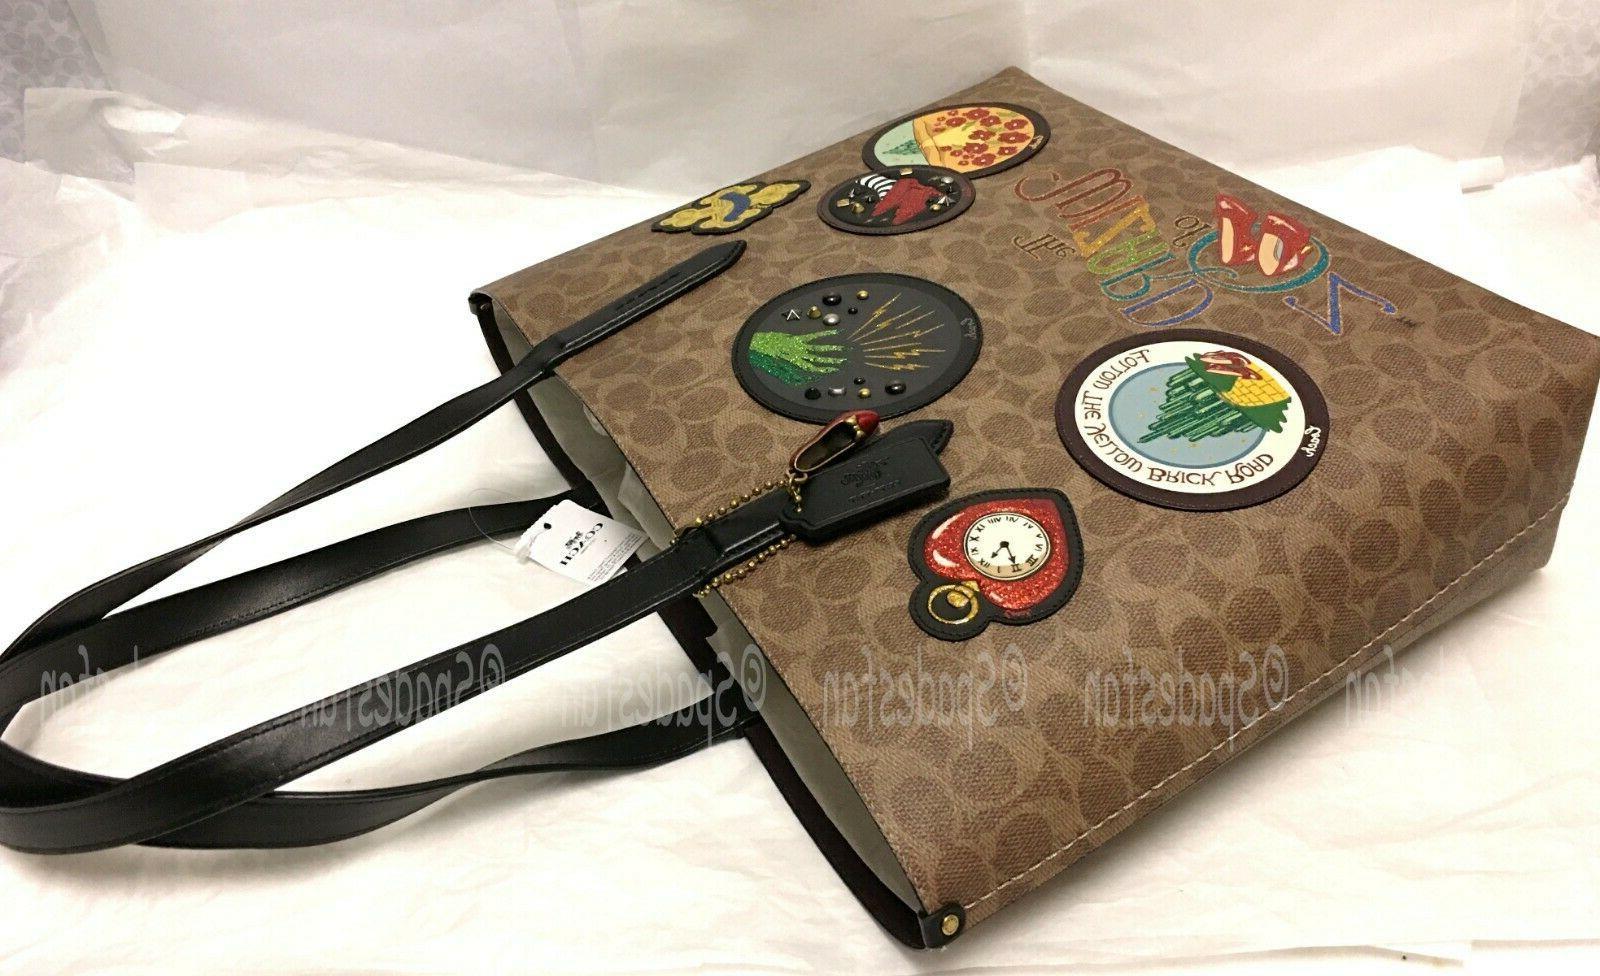 Coach of Oz Signature Bag TAN Patches